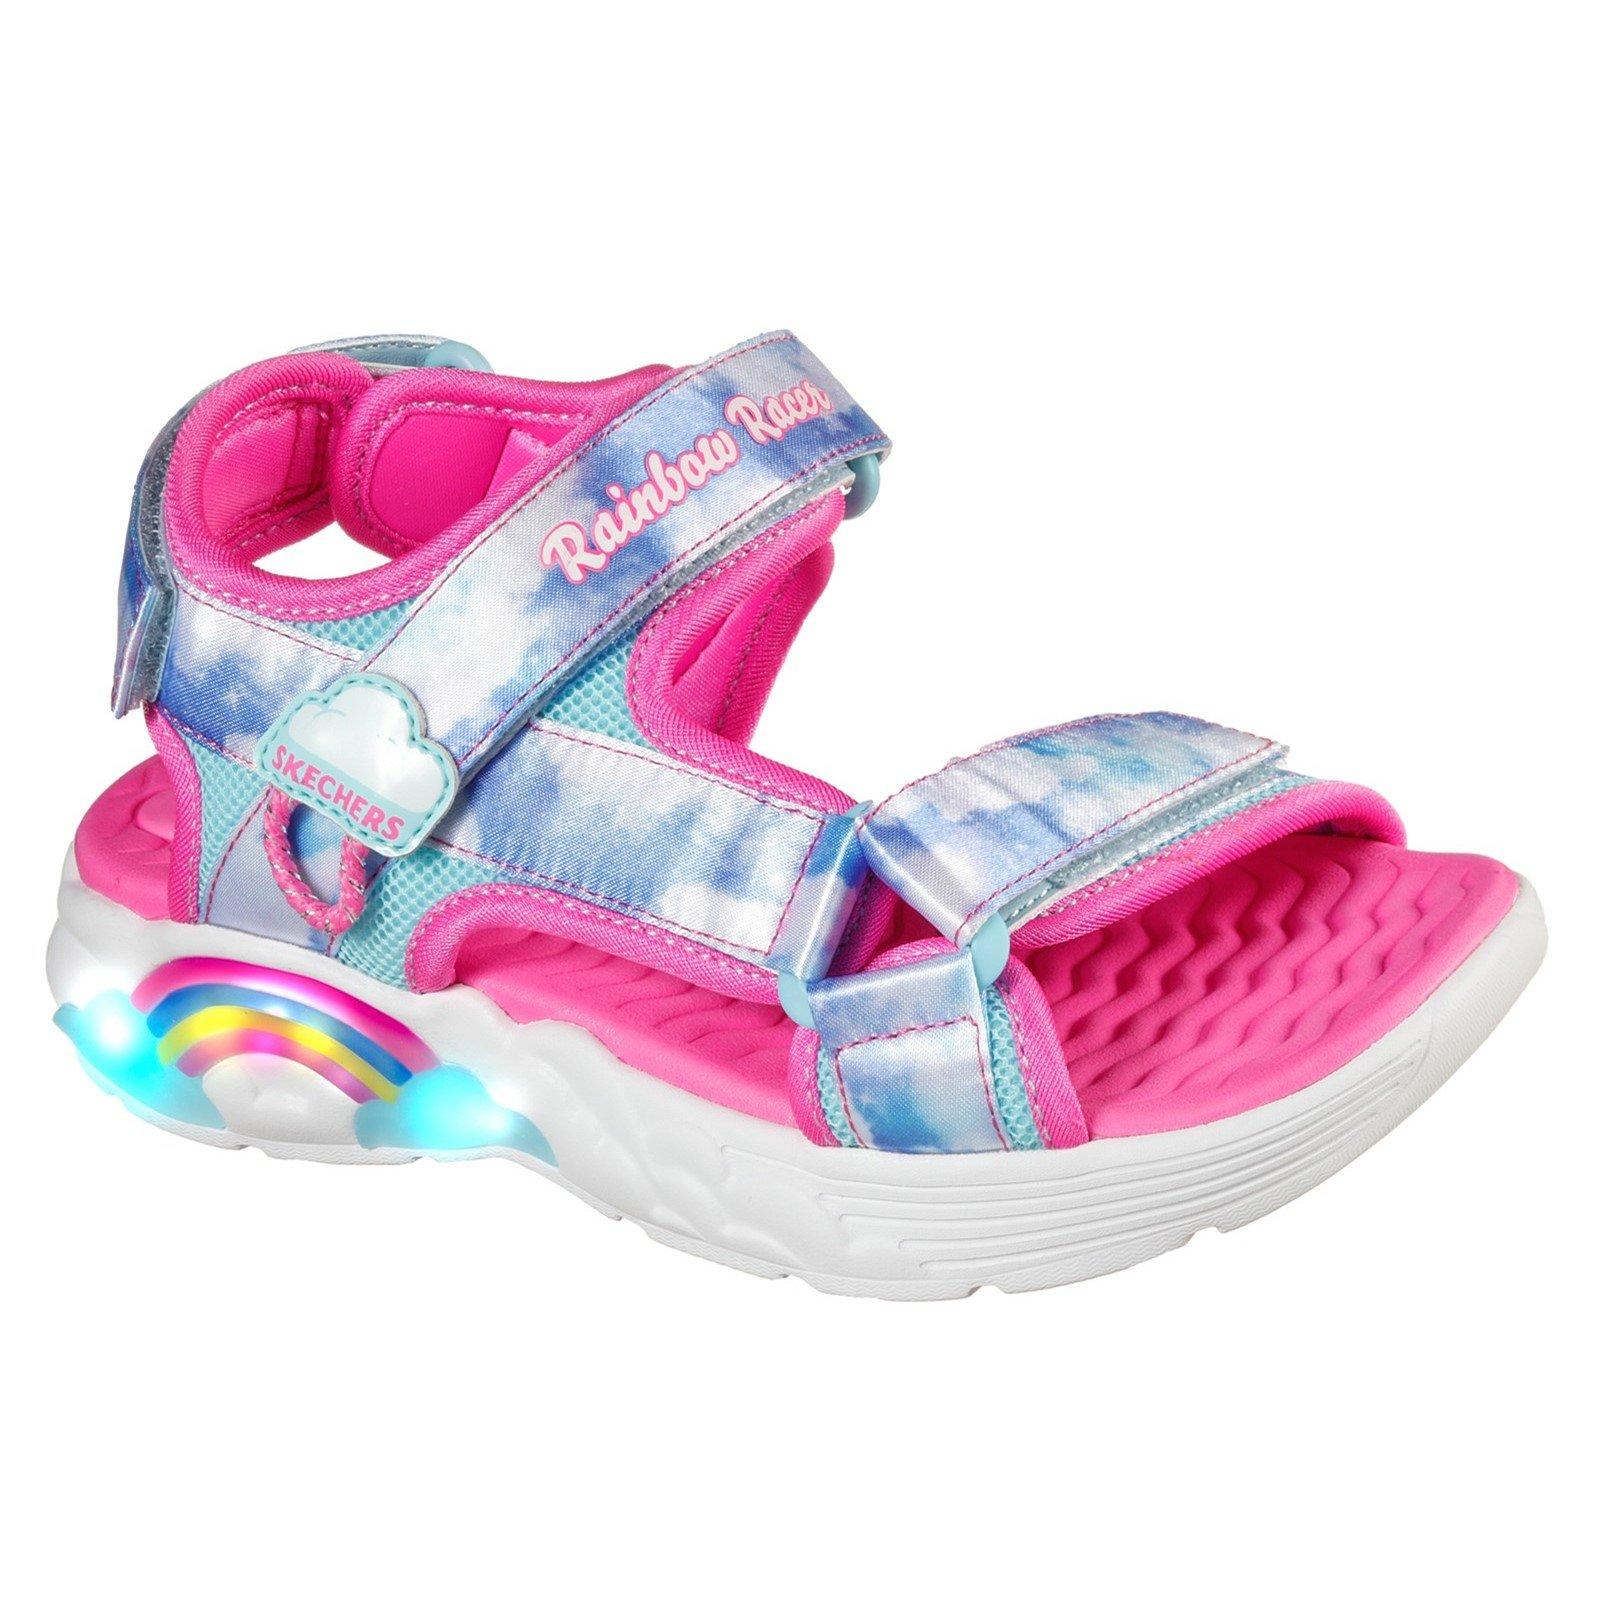 Skechers Unisex Rainbow Racer Summer Sky Beach Sandals Multicolor 32096 - Pink/Light Blue Pu 9